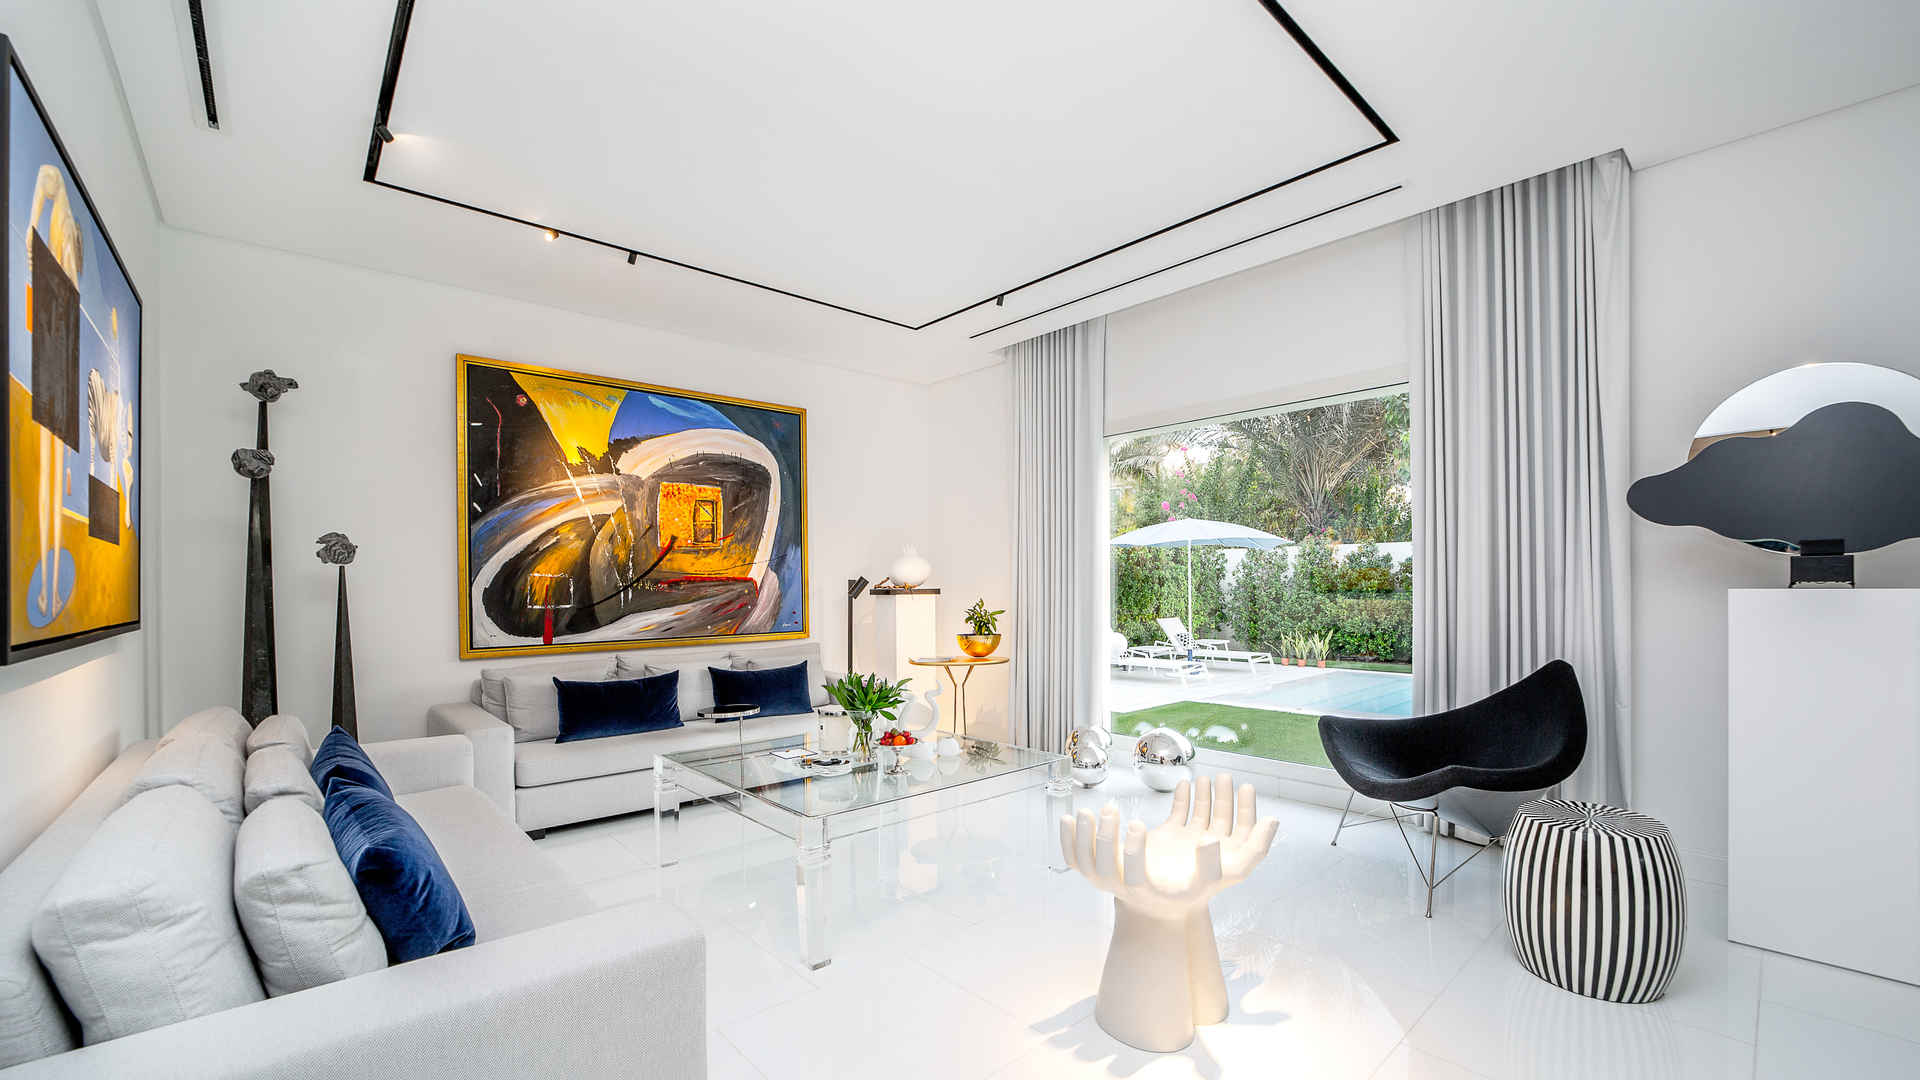 Meadows 9 Villas for Sale, Emirates Living, Dubai